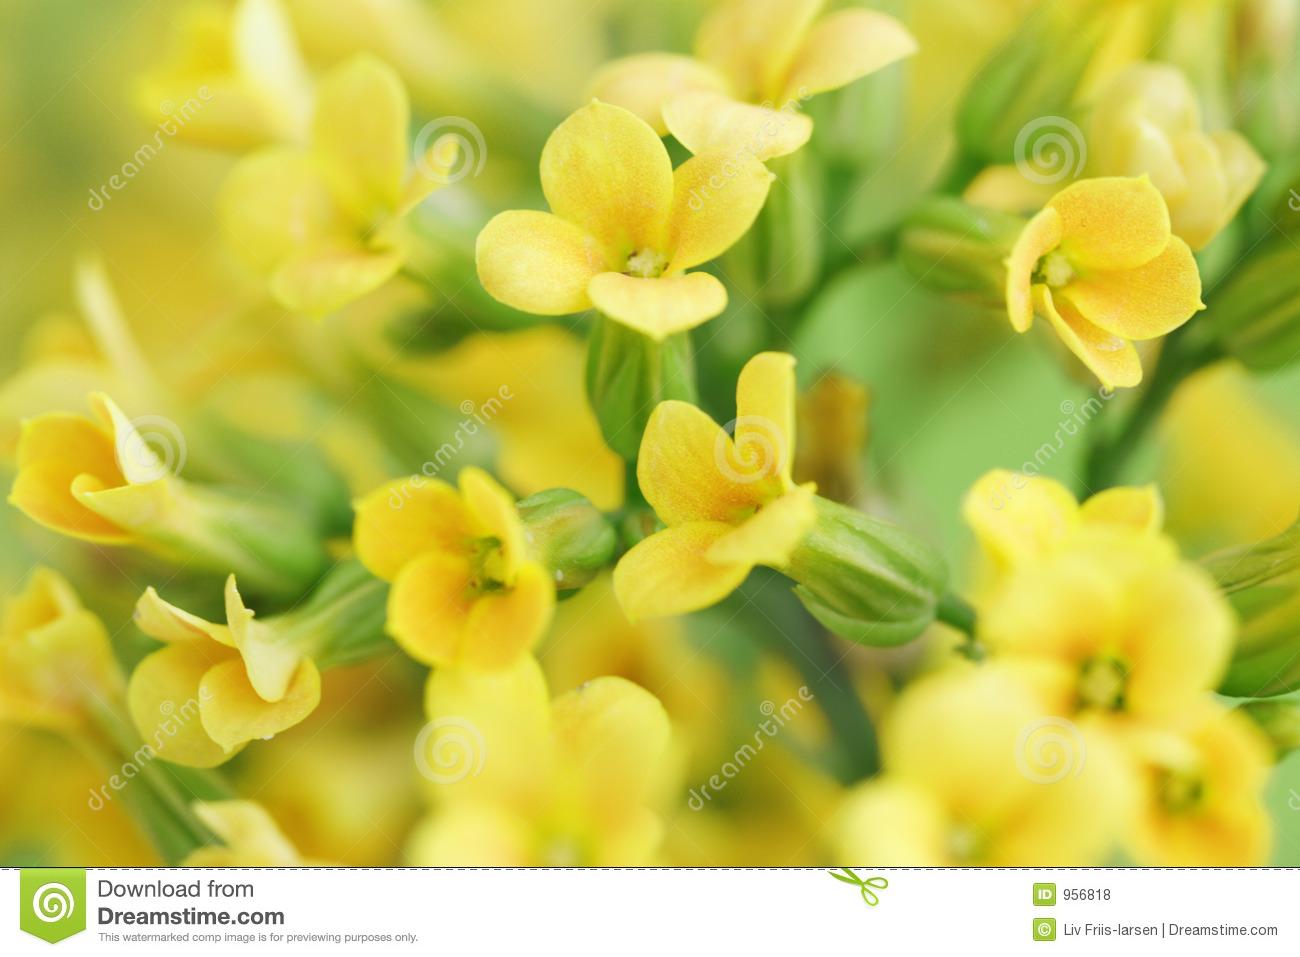 Dream yellow flowers gallery fresh lotus flowers yellow flowers in a dream 14 background wallpaper mightylinksfo